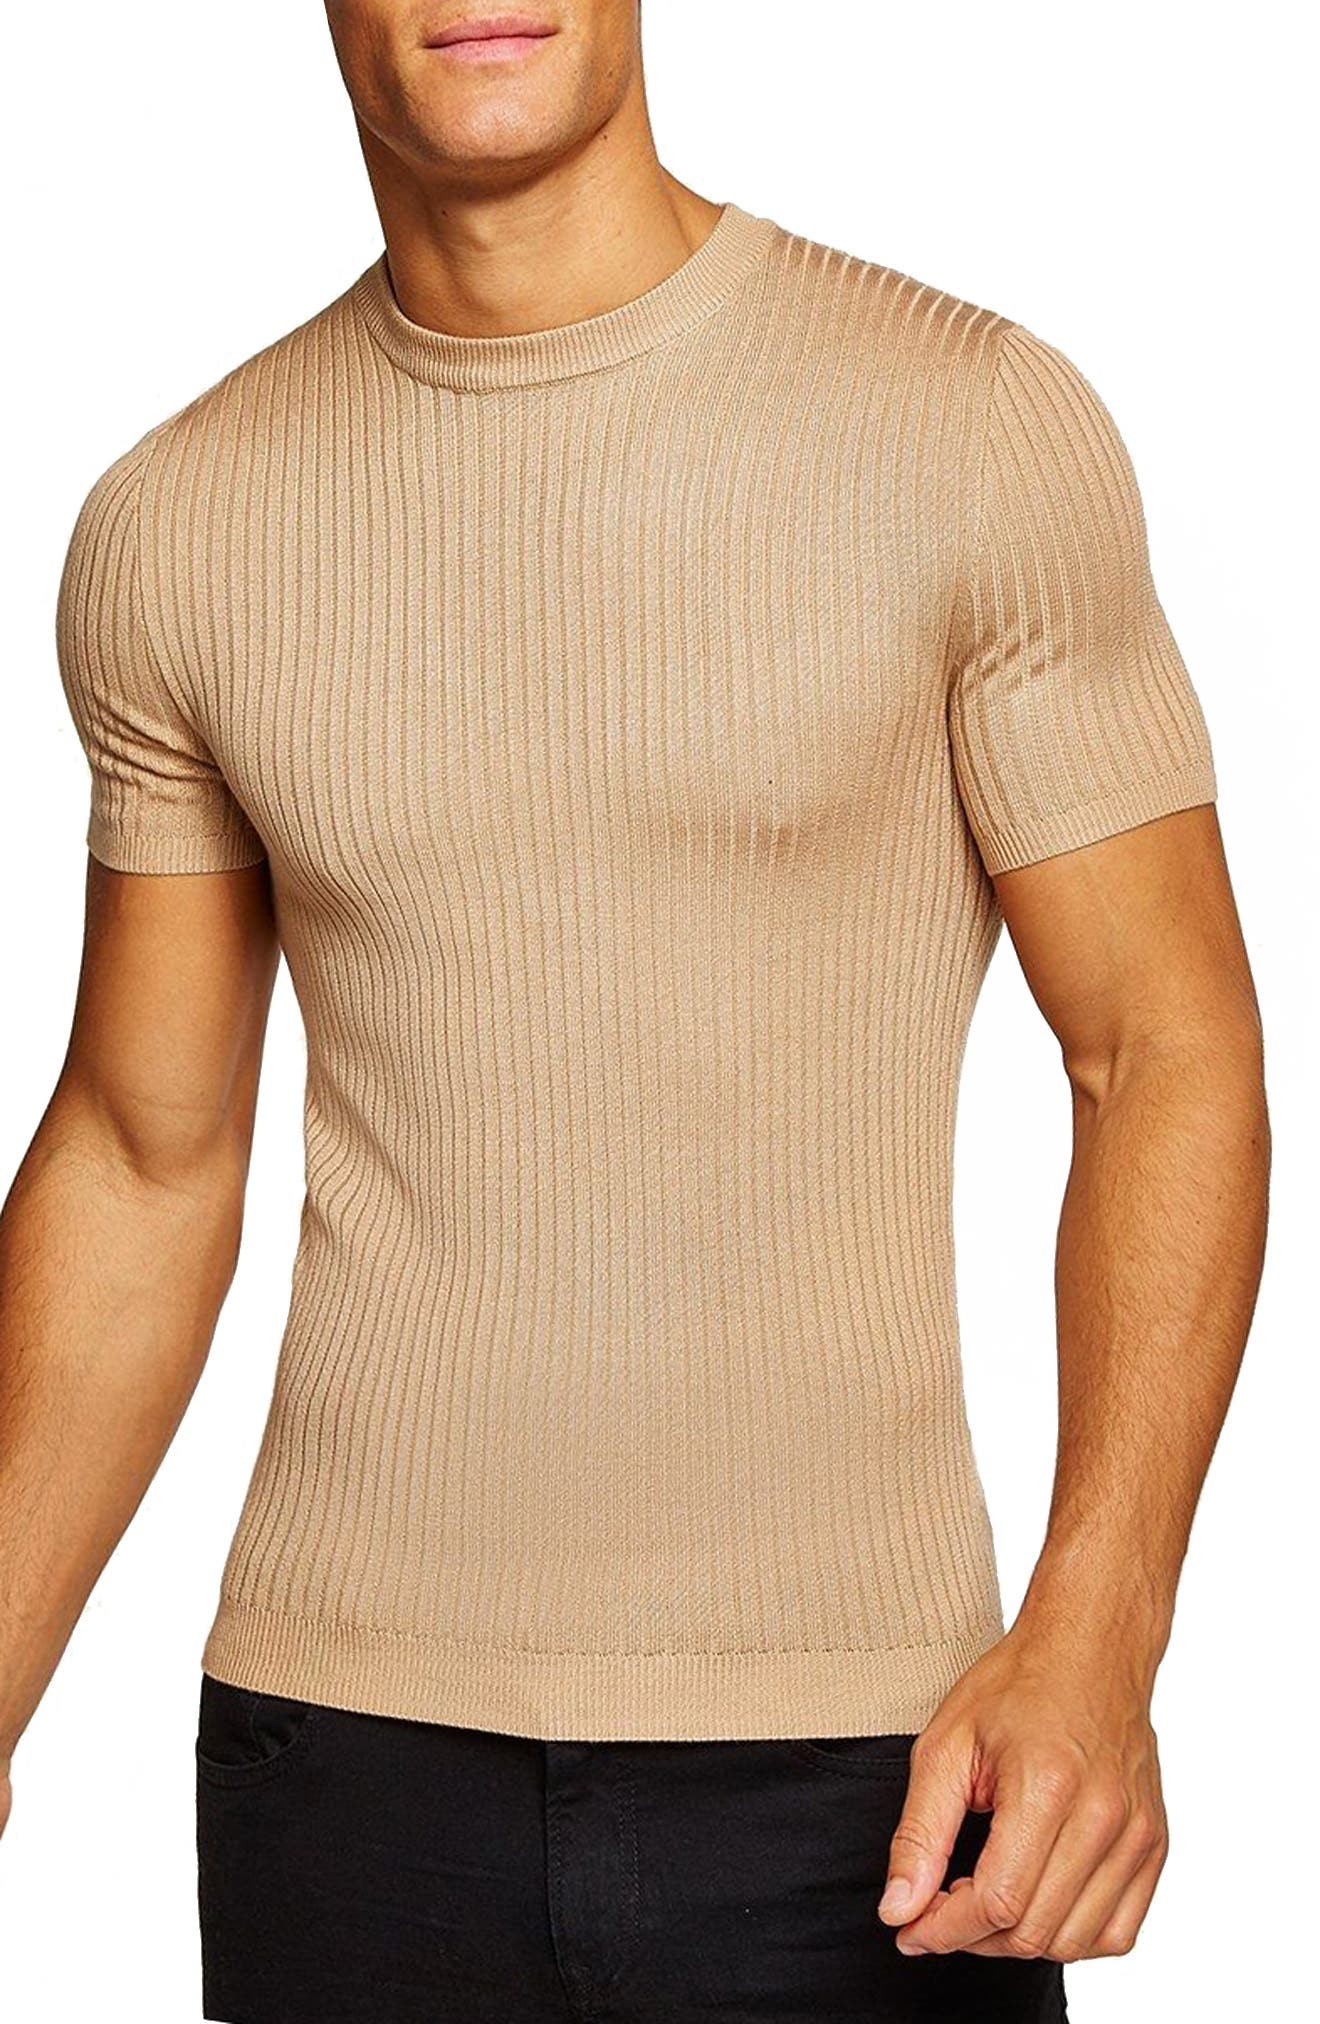 TOPMAN,                             Short Sleeve Muscle Fit Shirt,                             Main thumbnail 1, color,                             250